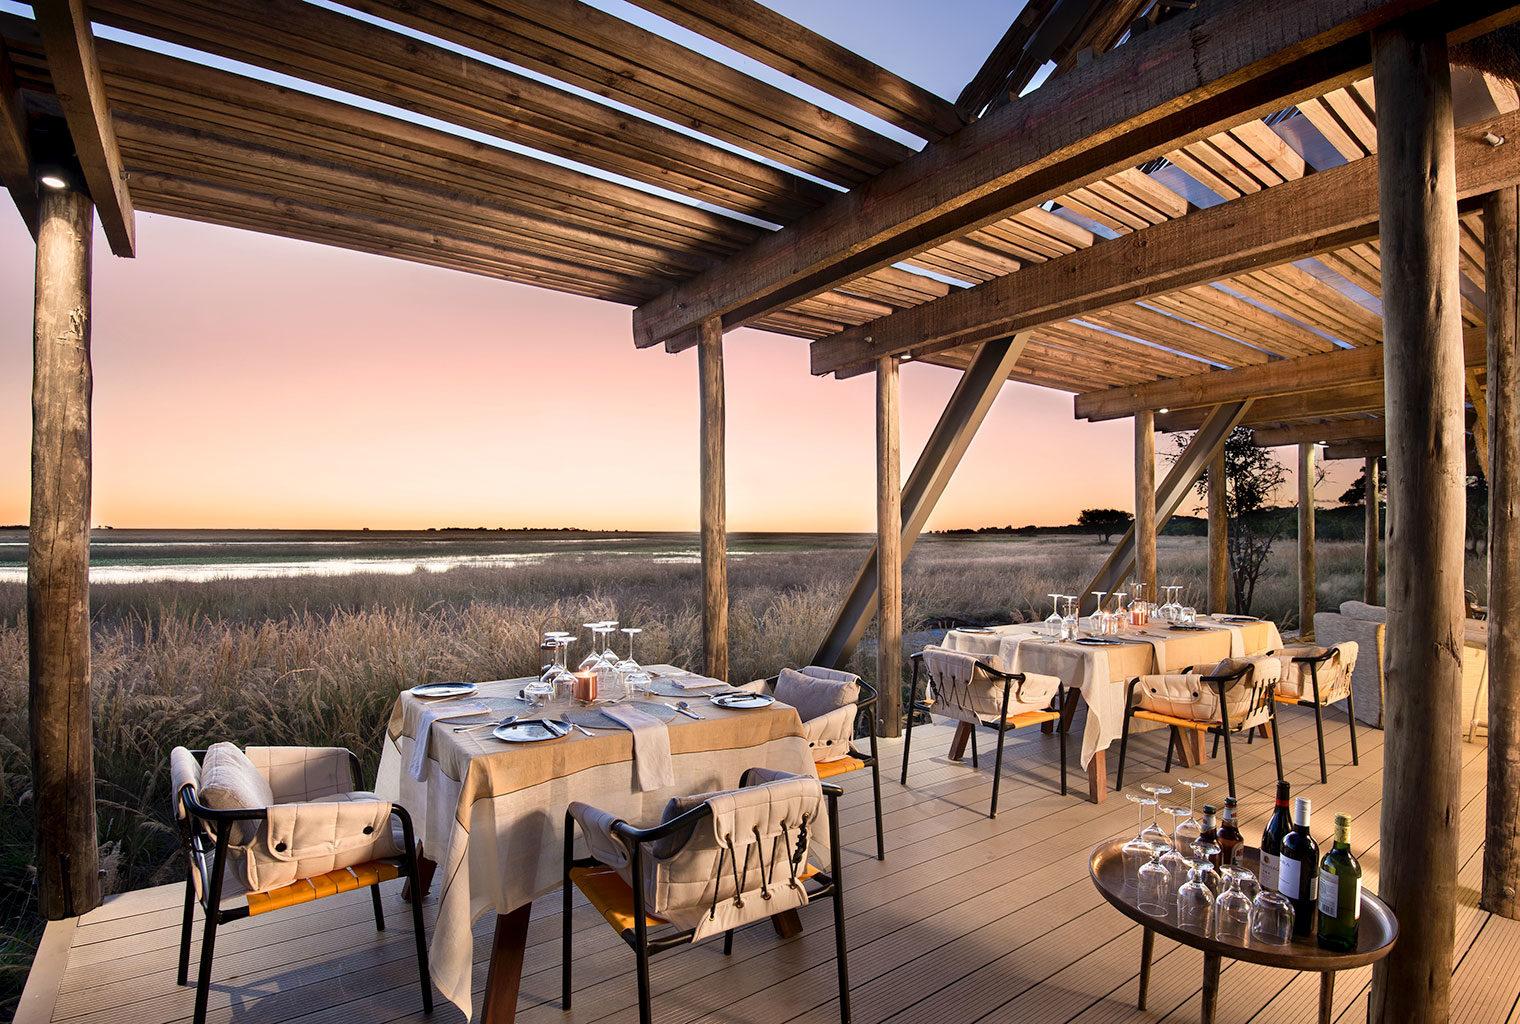 King-Lewanika-Zambia-dining